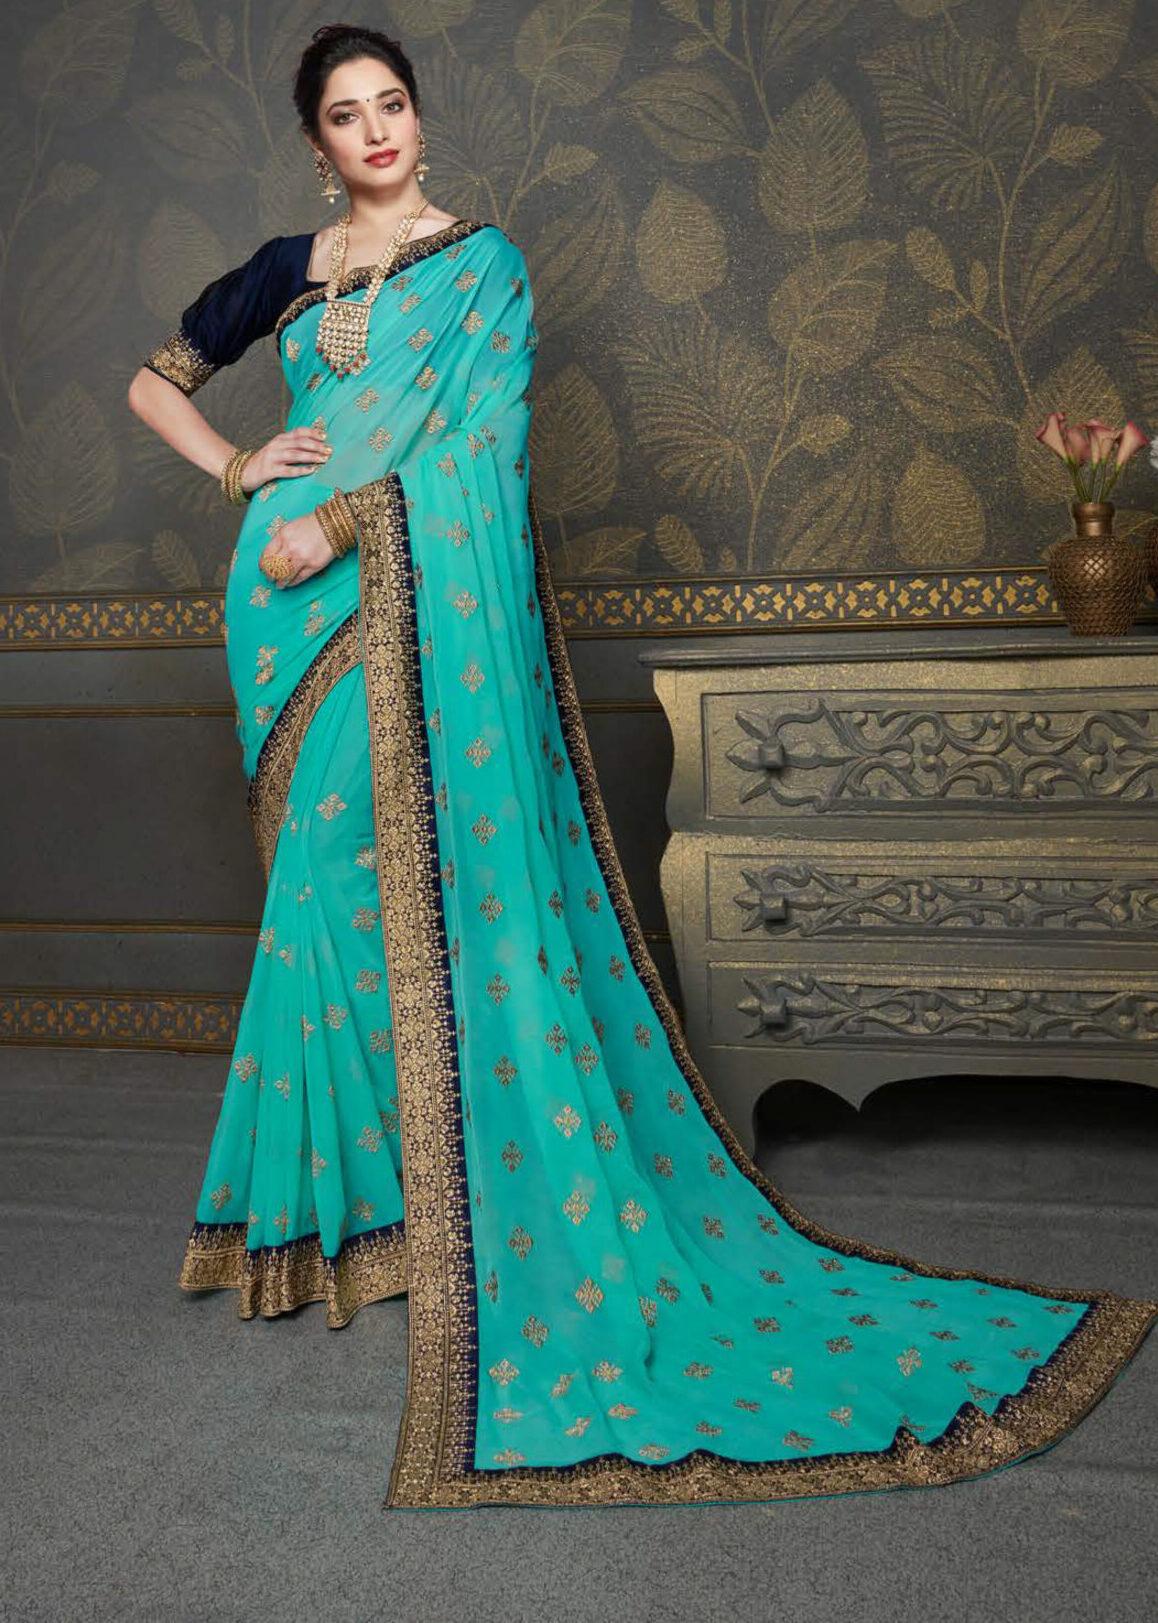 Sky Blue Colour Chiffon Gold Border Party Wear Saree New Design